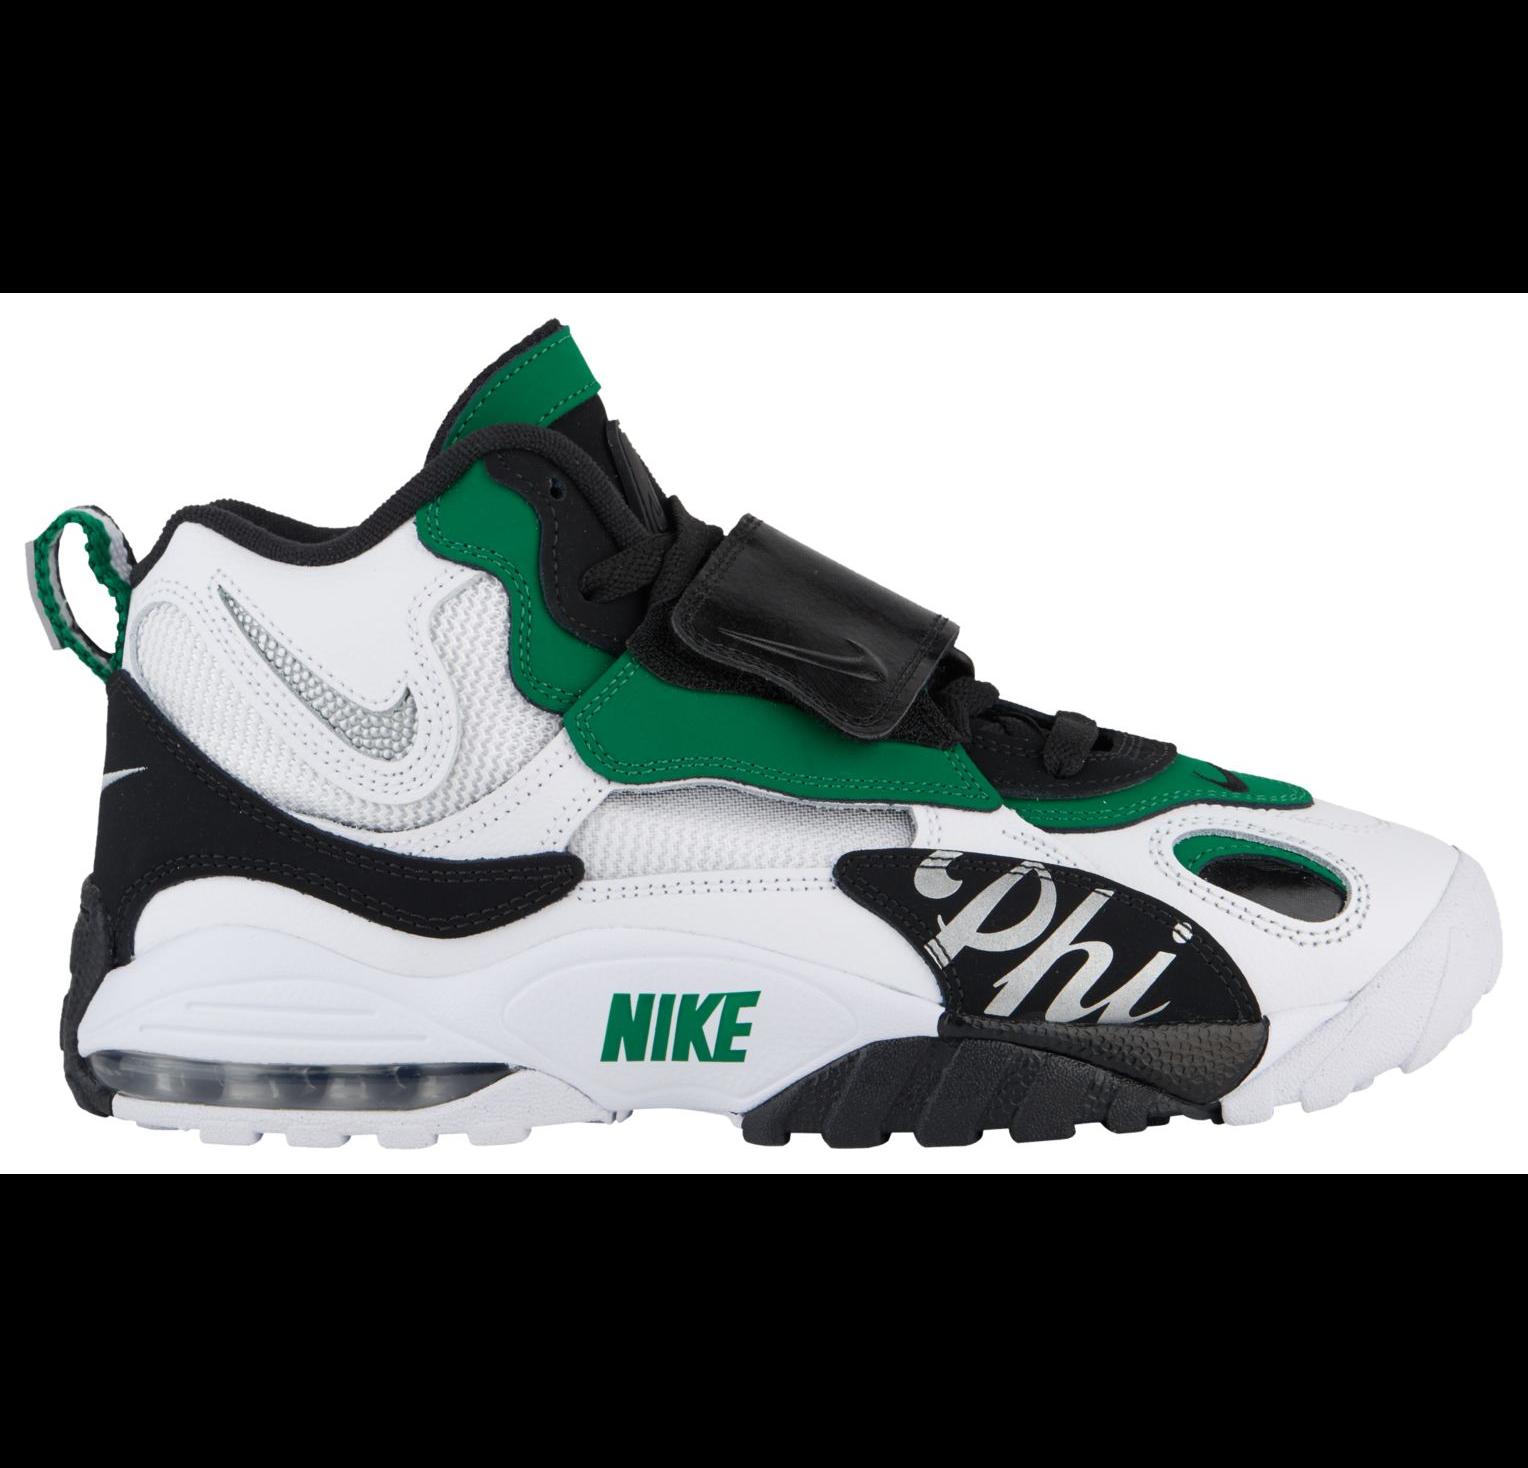 54779a73f0 Nike Air Max Speed Turf Philadelphia Eagles BV1228 100 – Housakicks